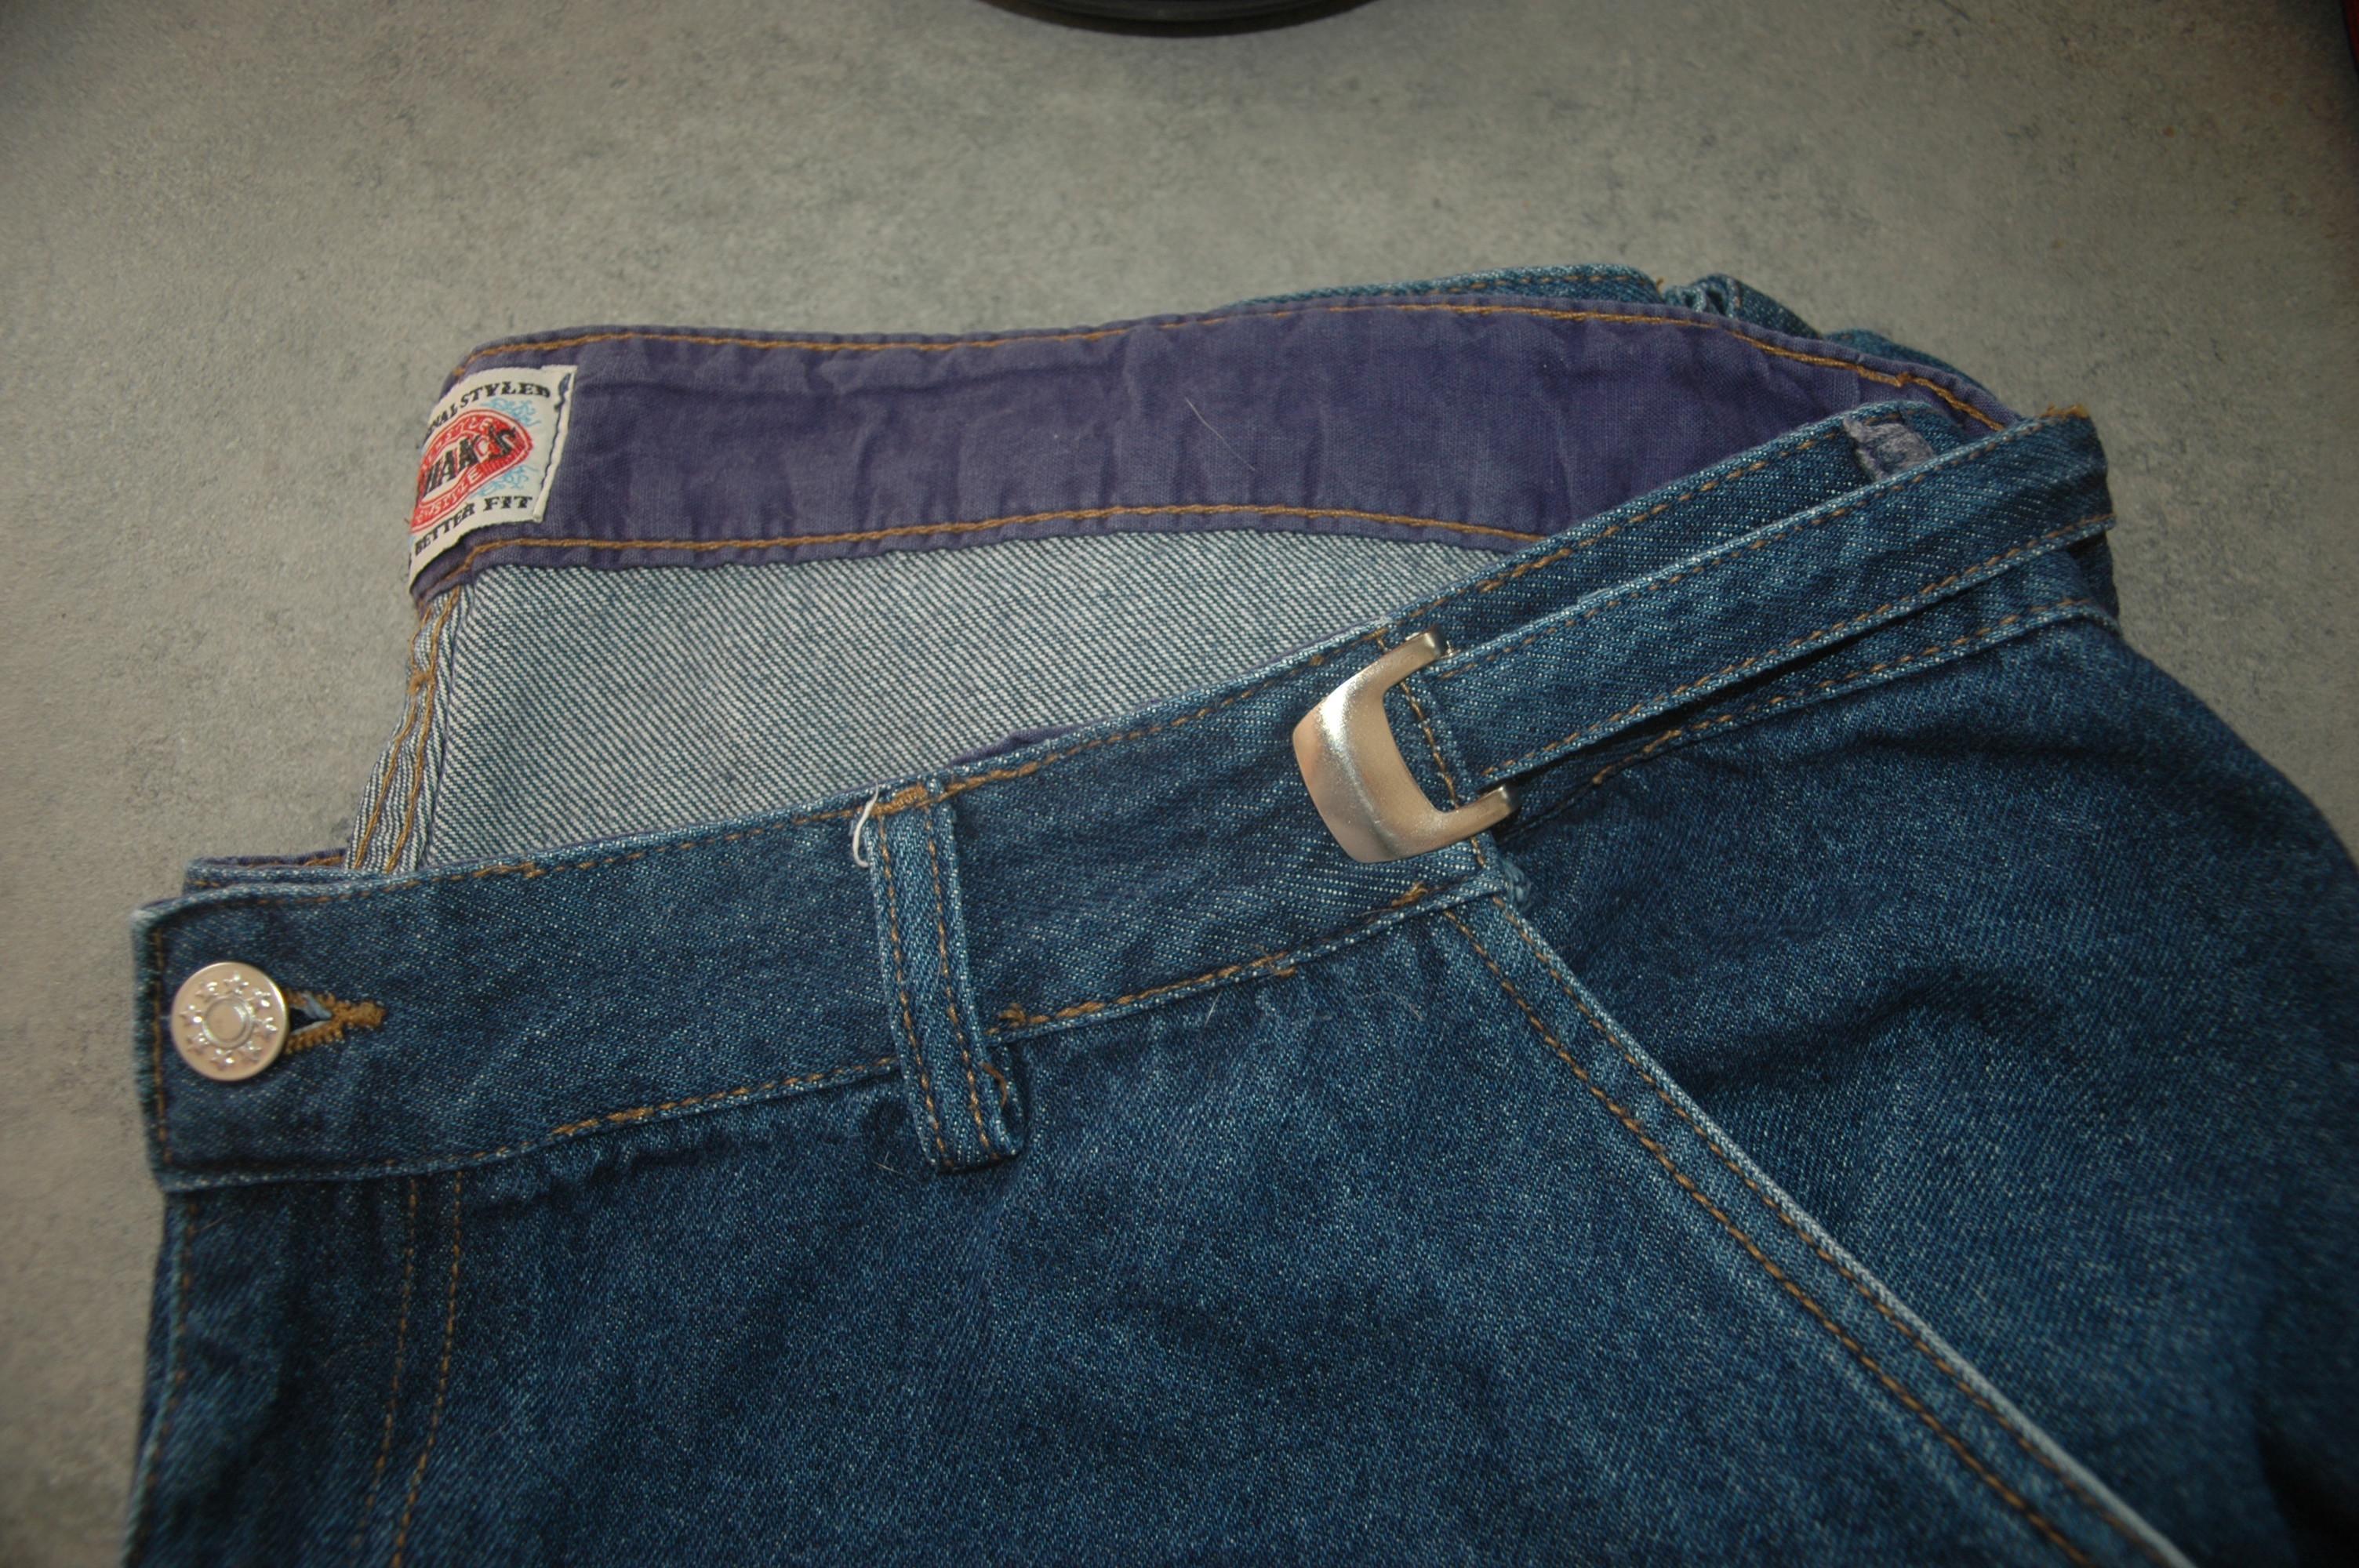 troc de troc jean homme taille 58 image 1